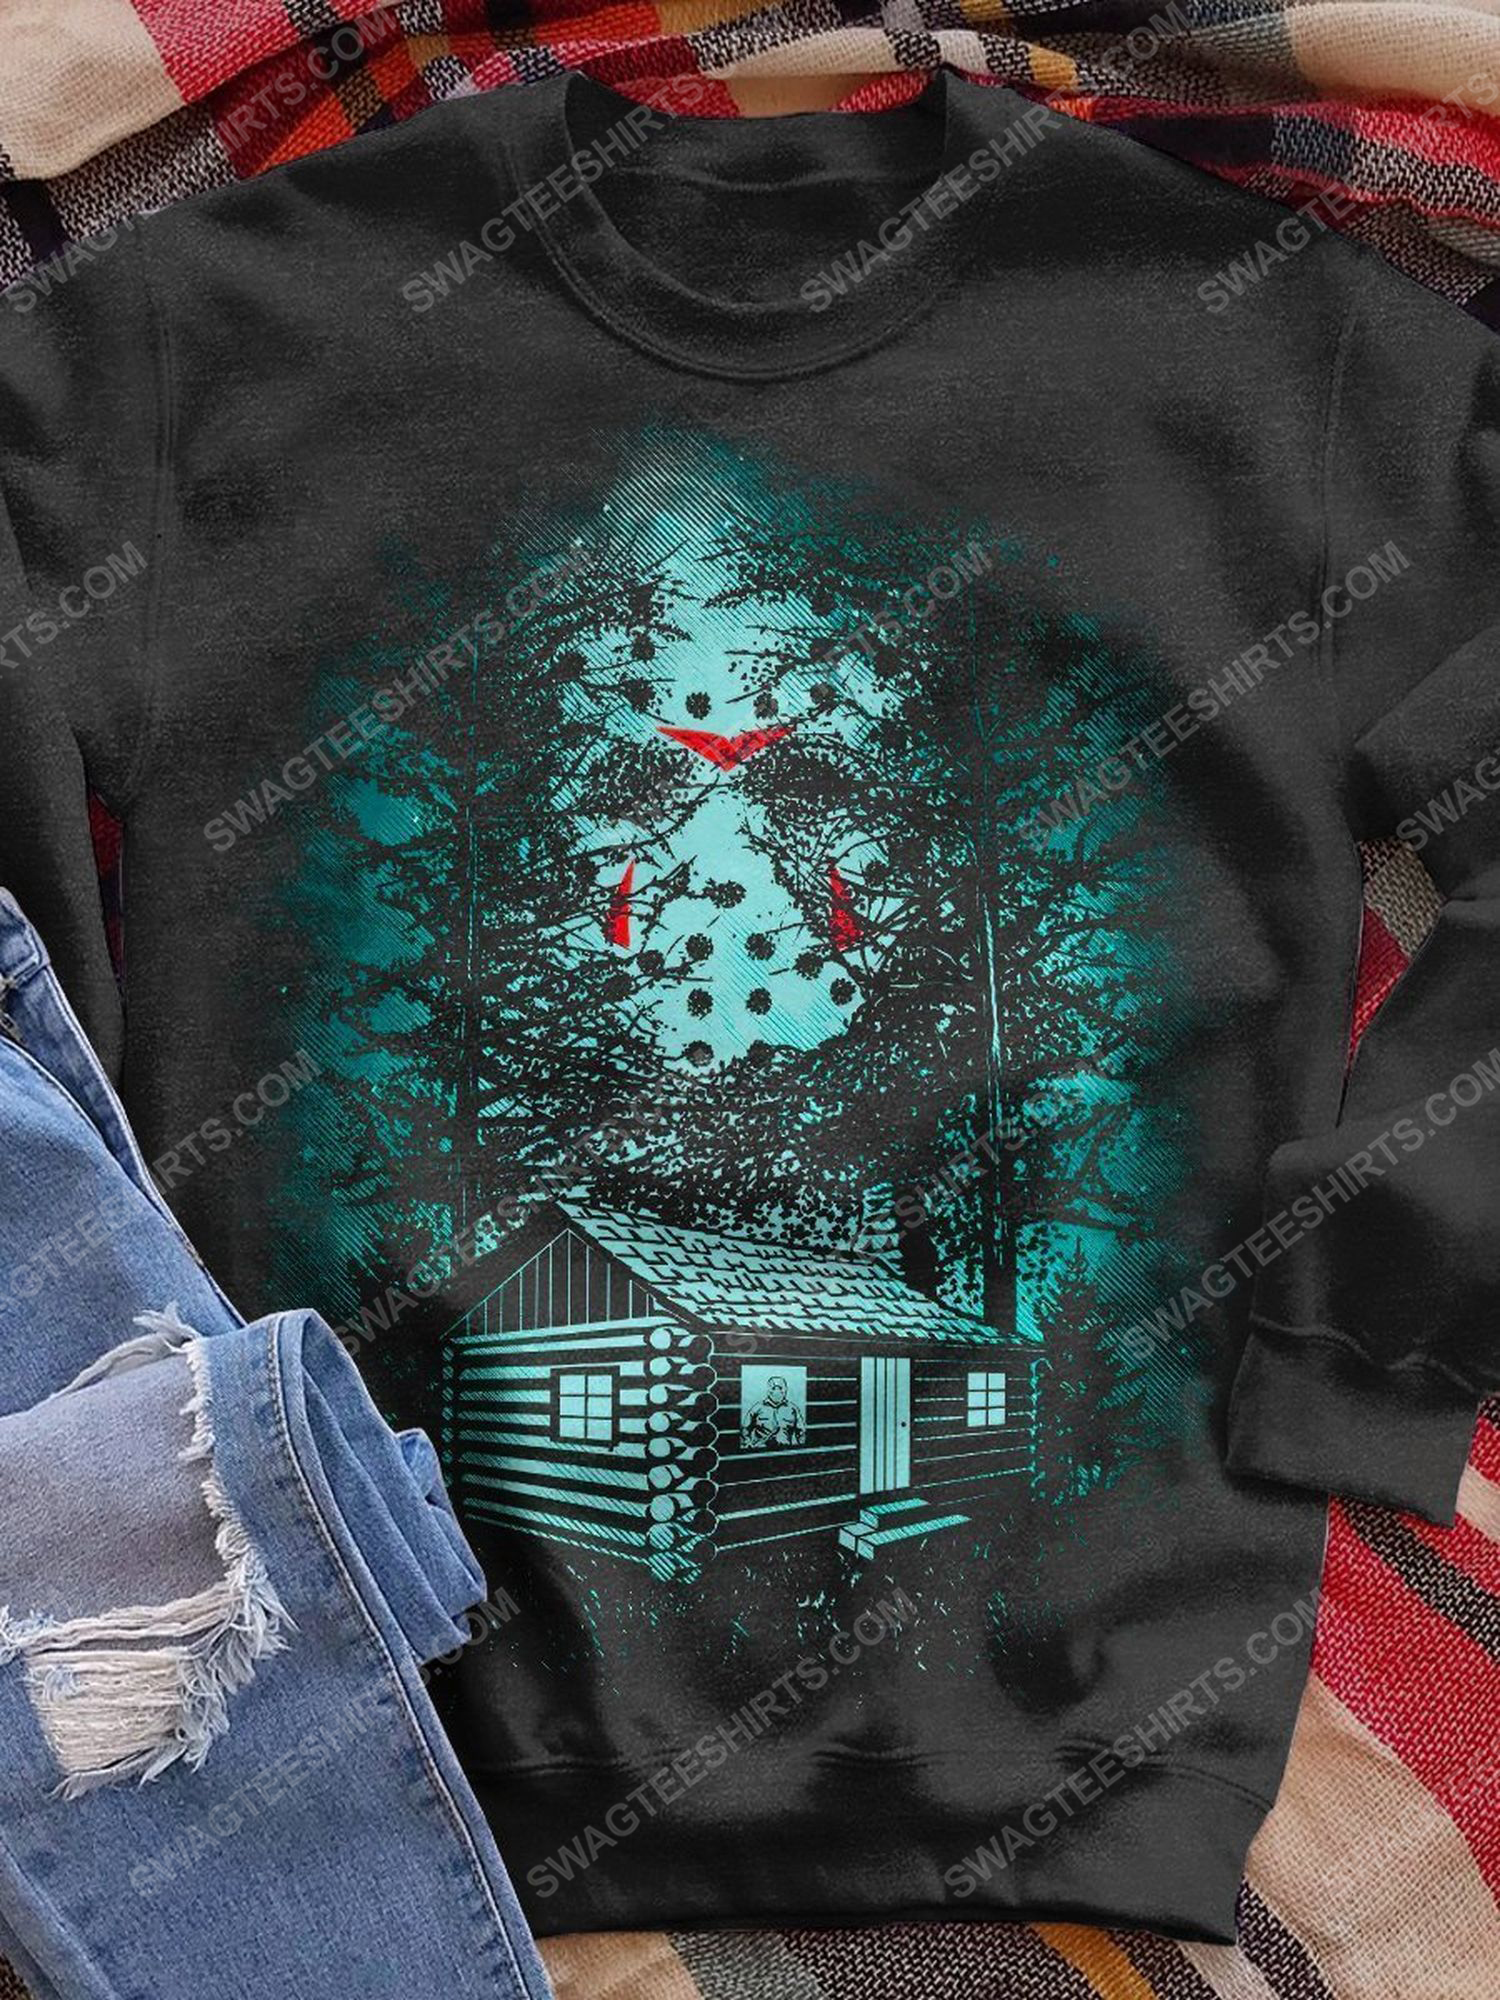 Halloween jason voorhees friday the 13th series shirt